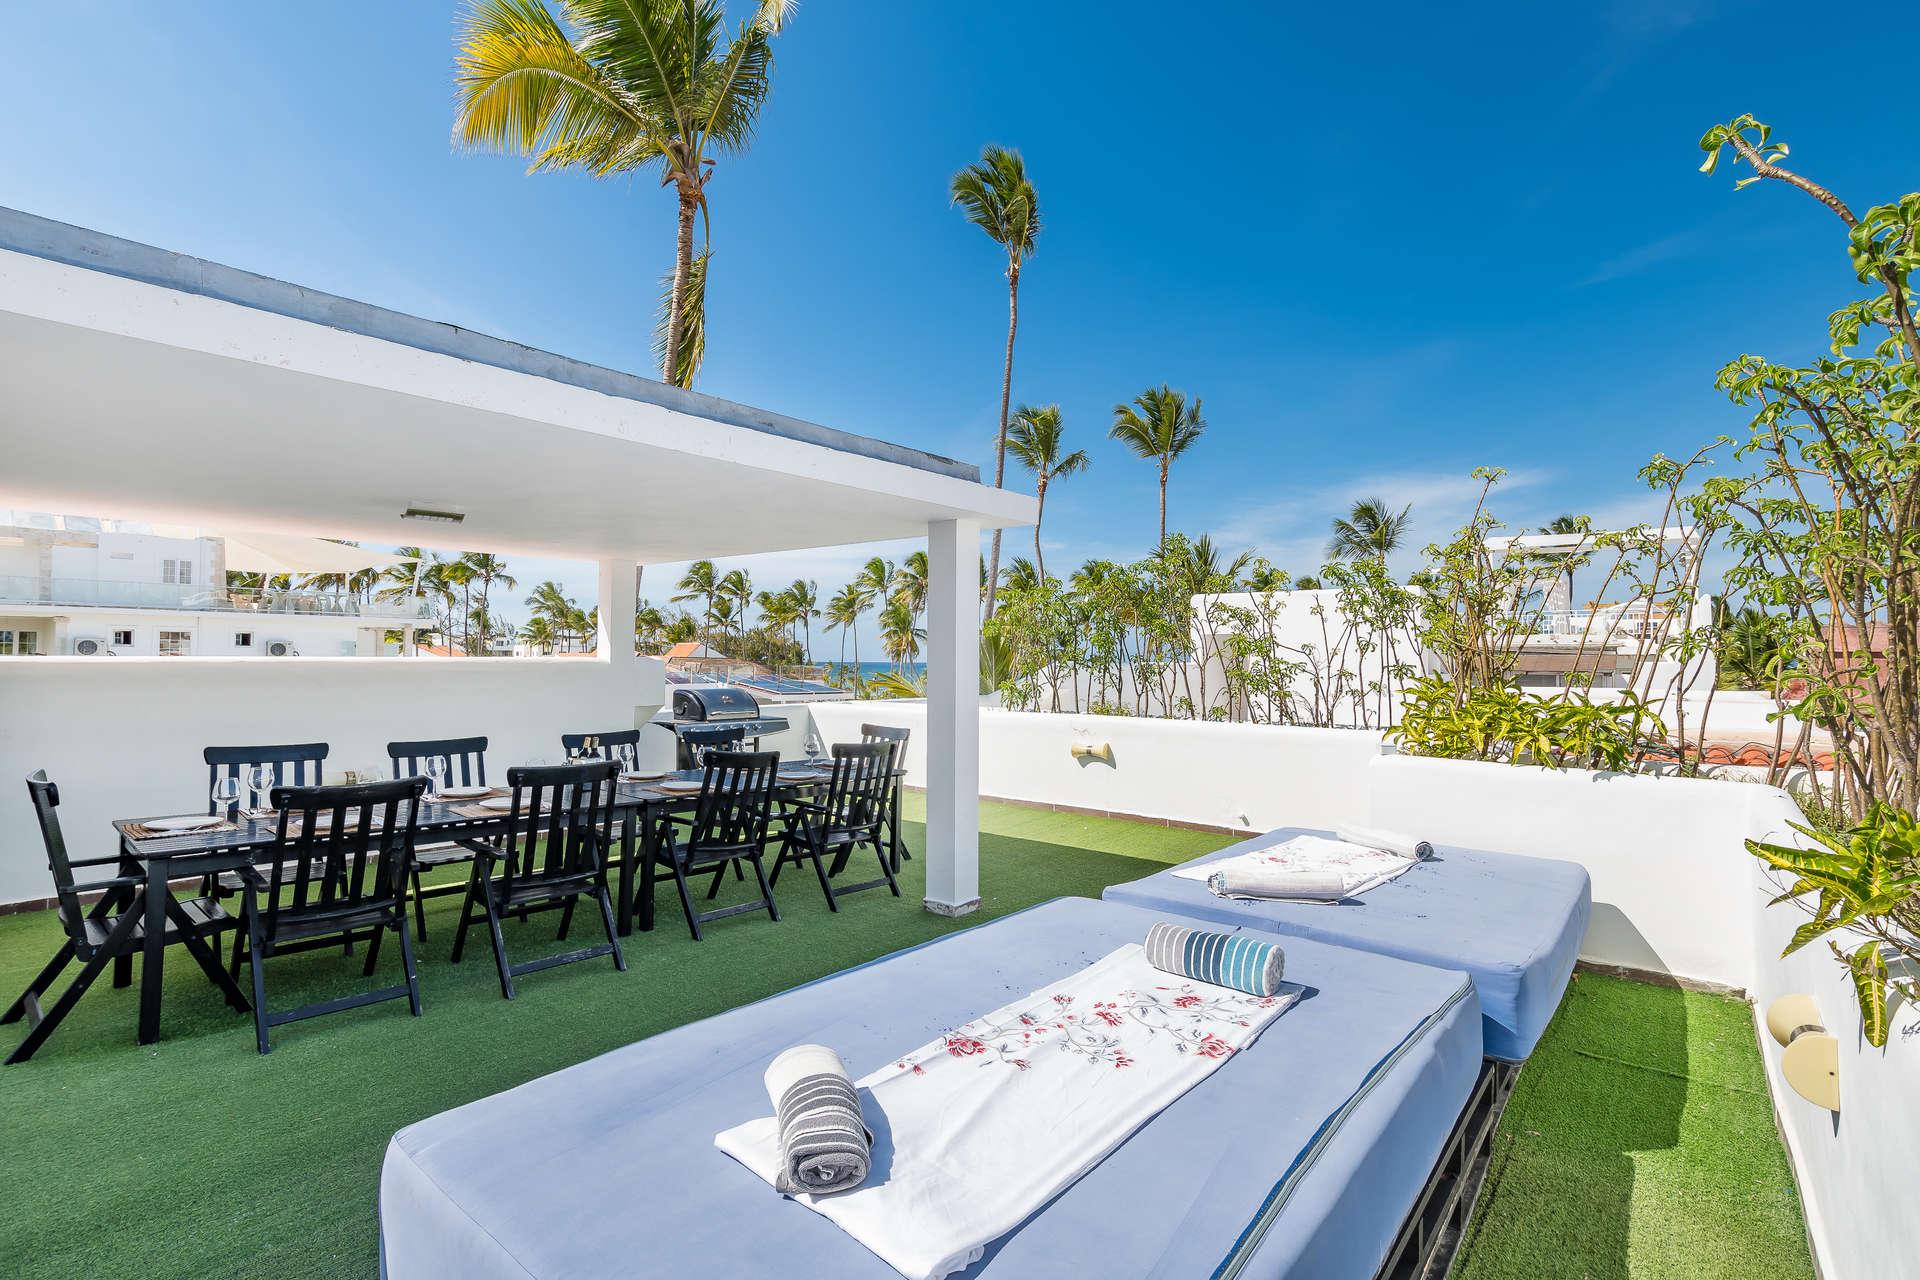 Luxury villa rentals caribbean - Dominican republic - Punta cana - Bavaro - Palmera Penthouse - Image 1/16